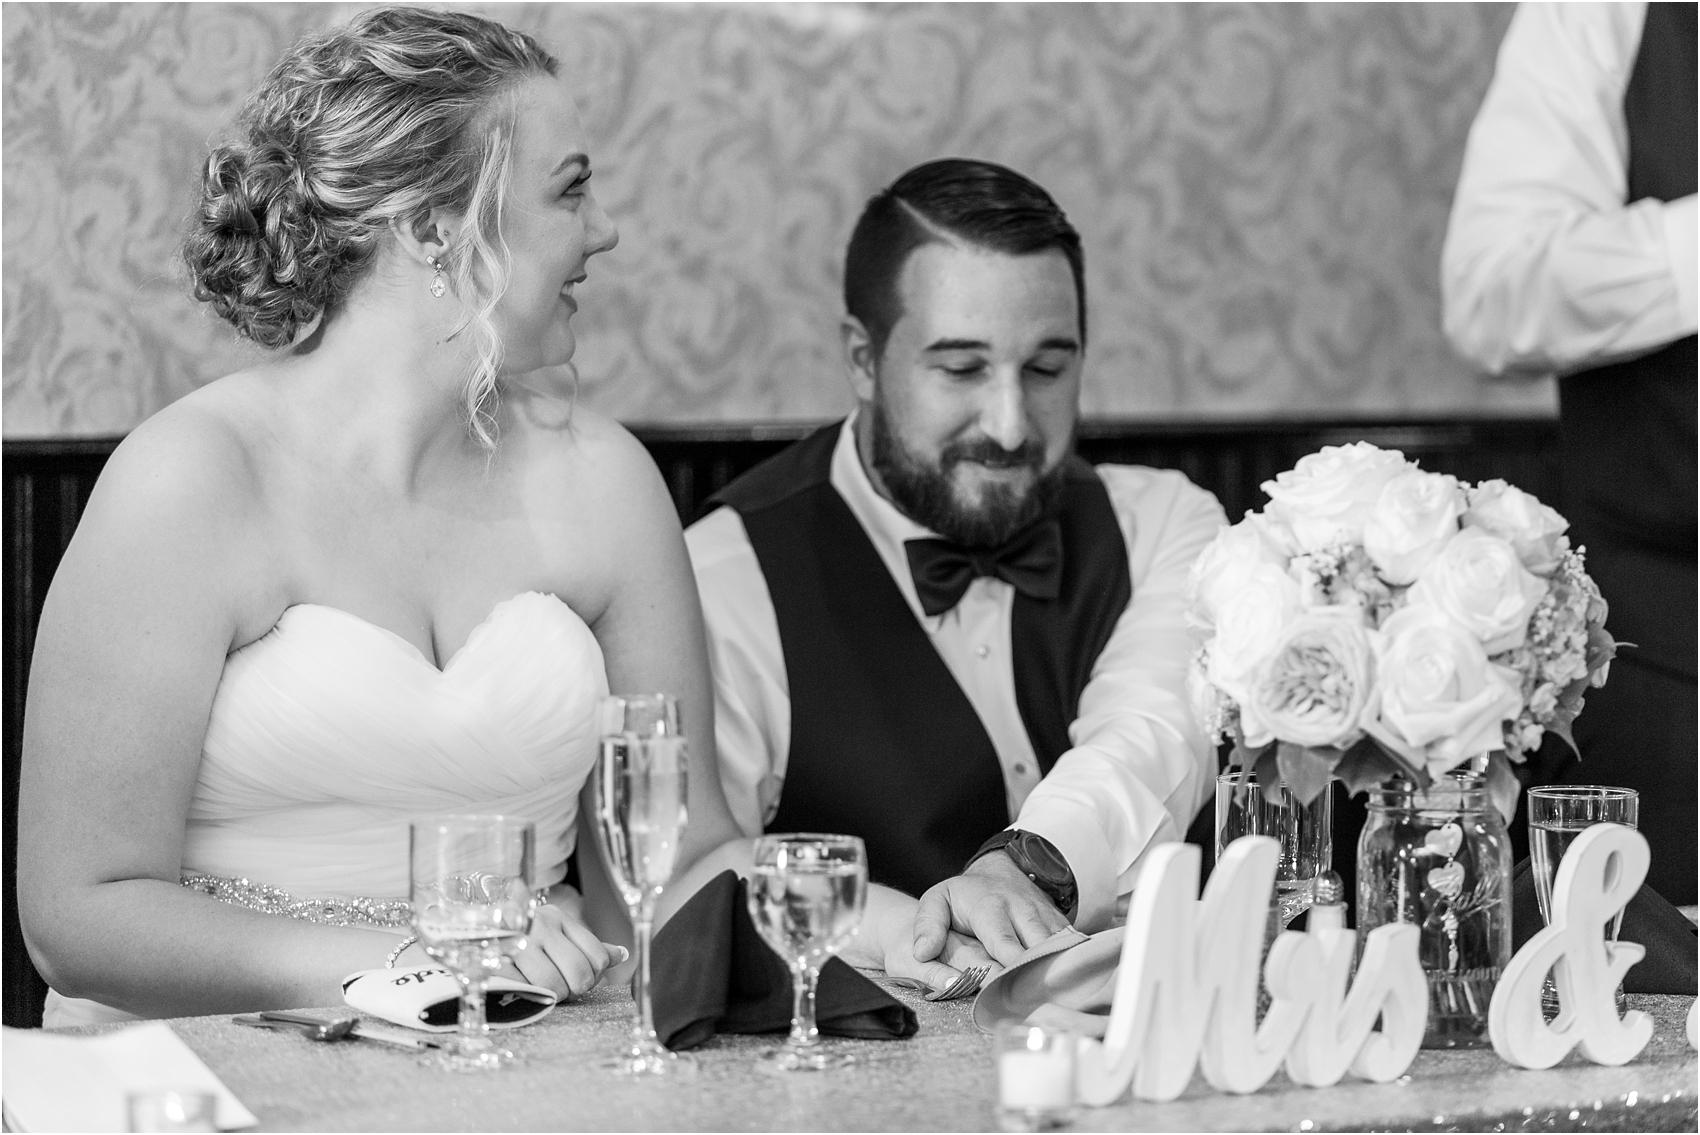 joyful-and-candid-navy-blush-wedding-photos-at-crystal-gardens-in-howell-mi-by-courtney-carolyn-photography_0081.jpg